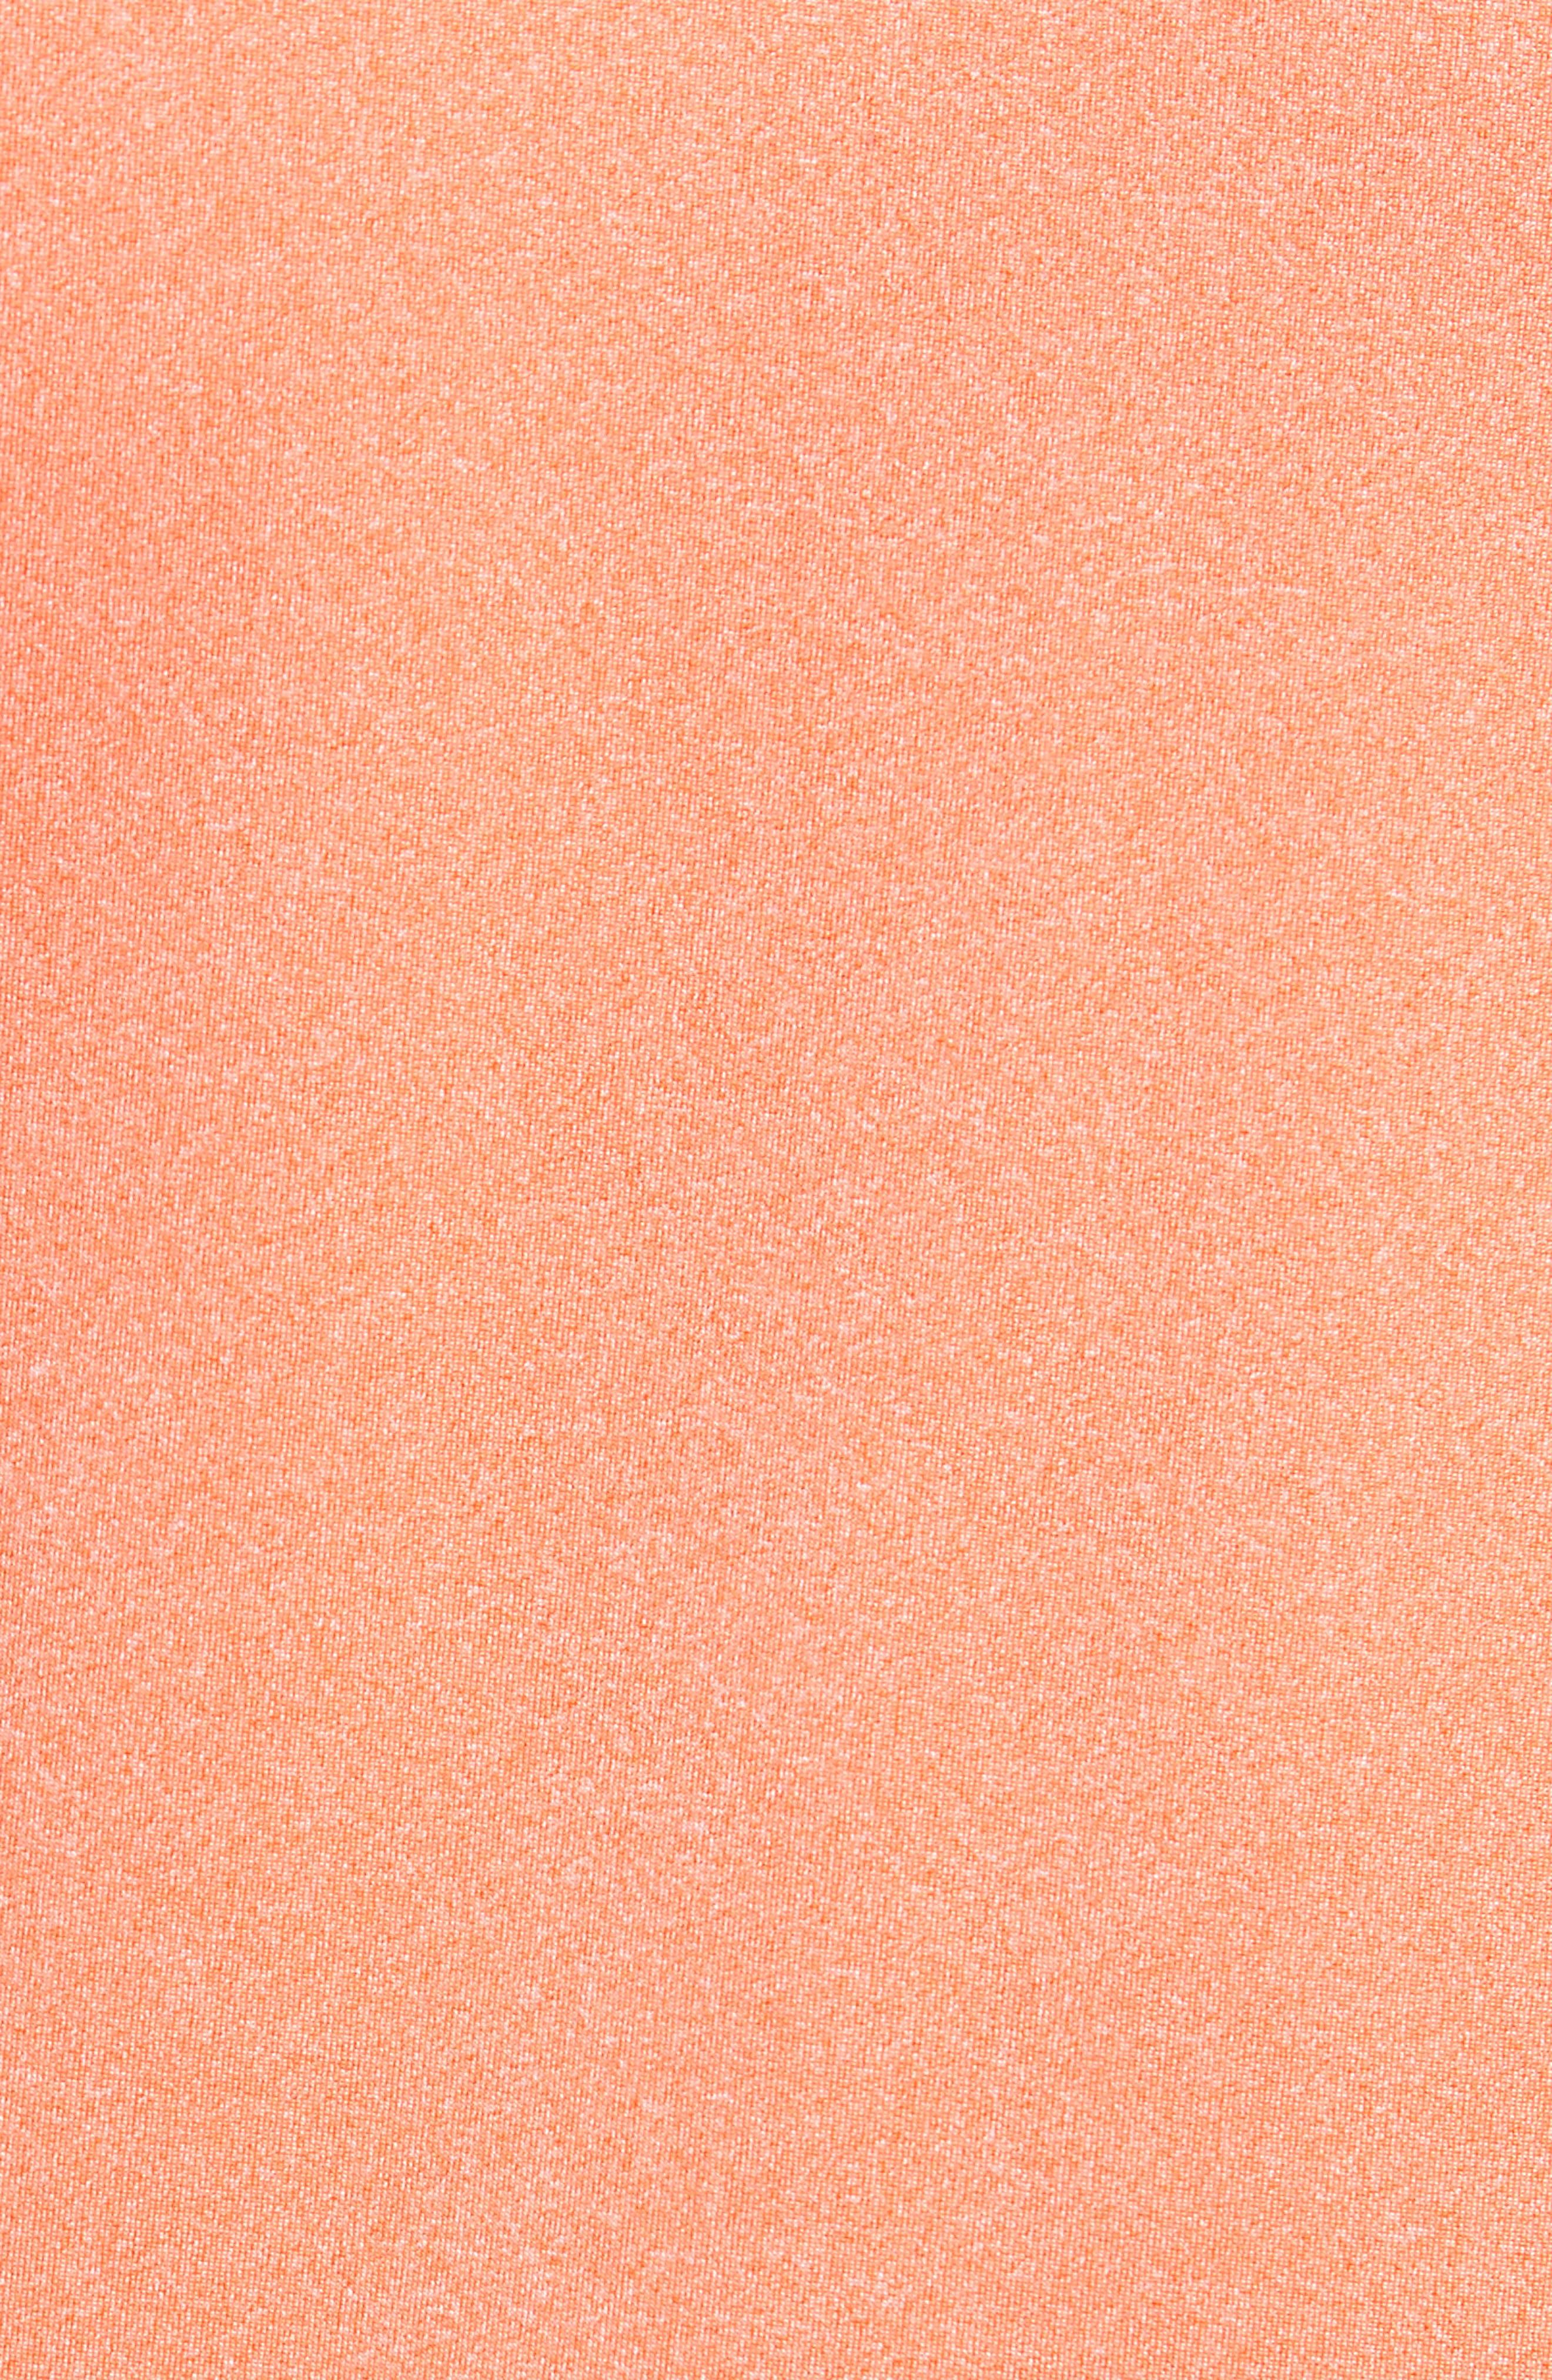 Endurance Cincinnati Bengals Regular Fit Pullover,                             Alternate thumbnail 5, color,                             COLLEGE ORANGE HEATHER